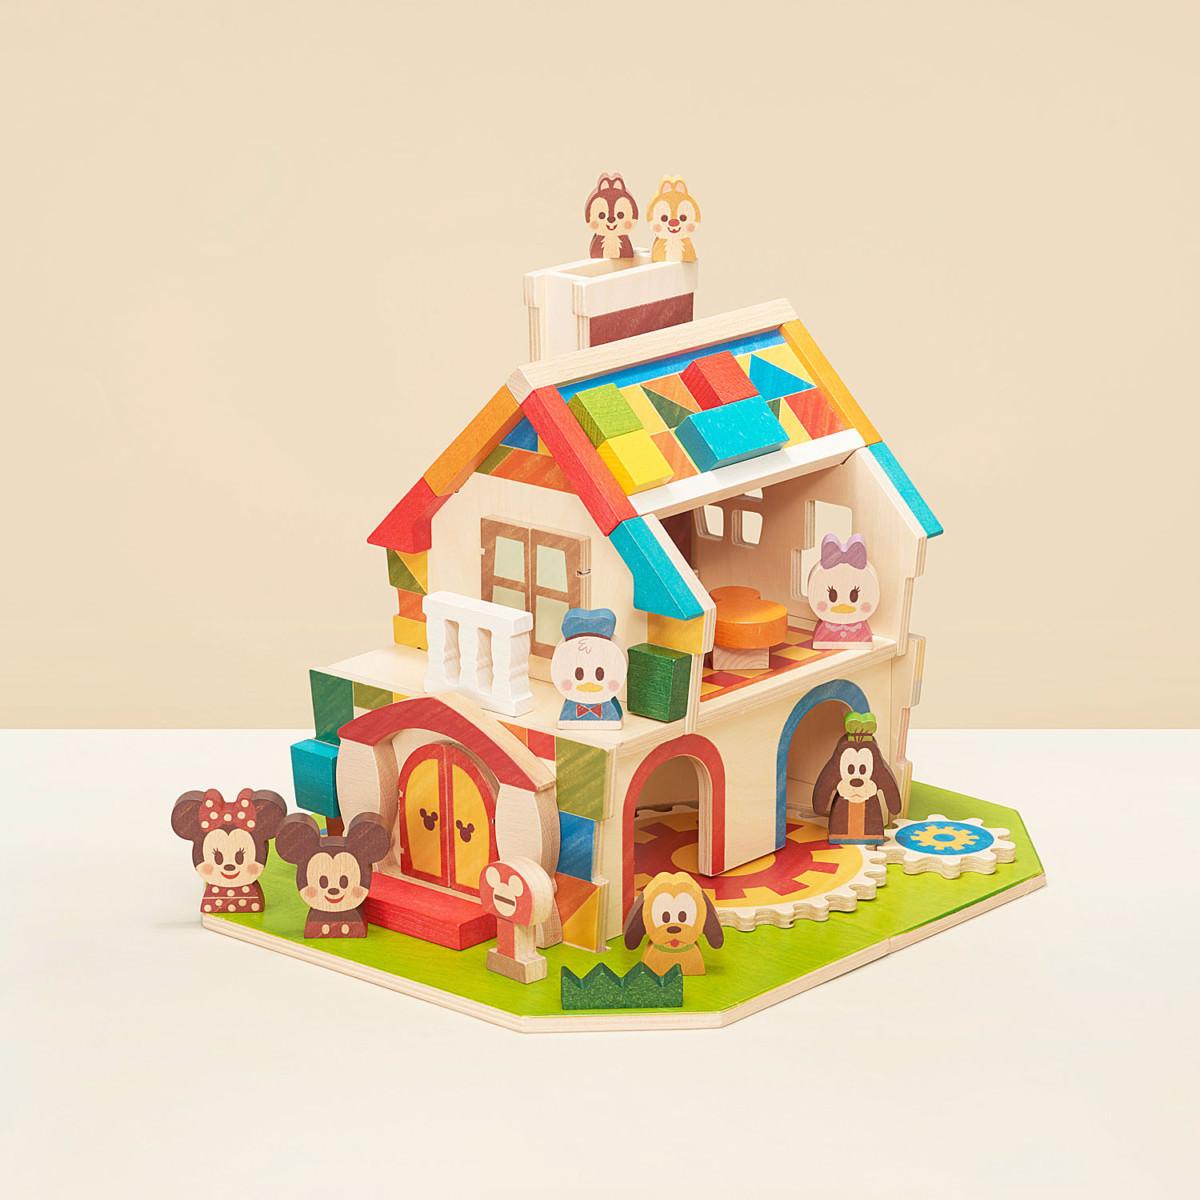 KIDEA HOUSE ミッキー&フレンズ3